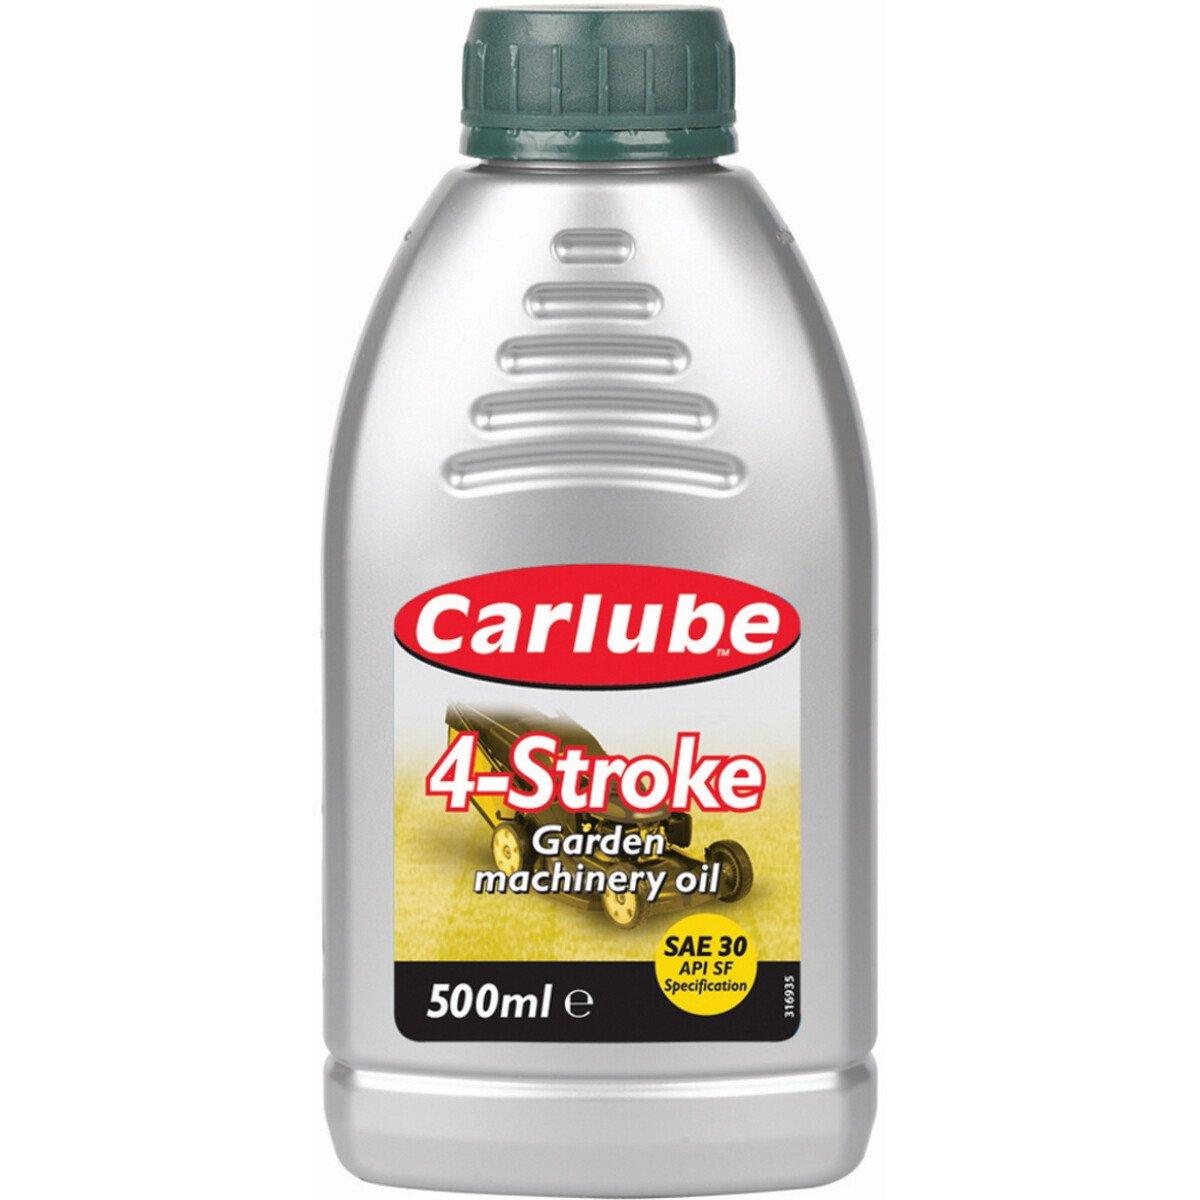 Tetrosyl XLM501 Carlube SAE30 4-Stroke Garden Machinery Oil 500ml